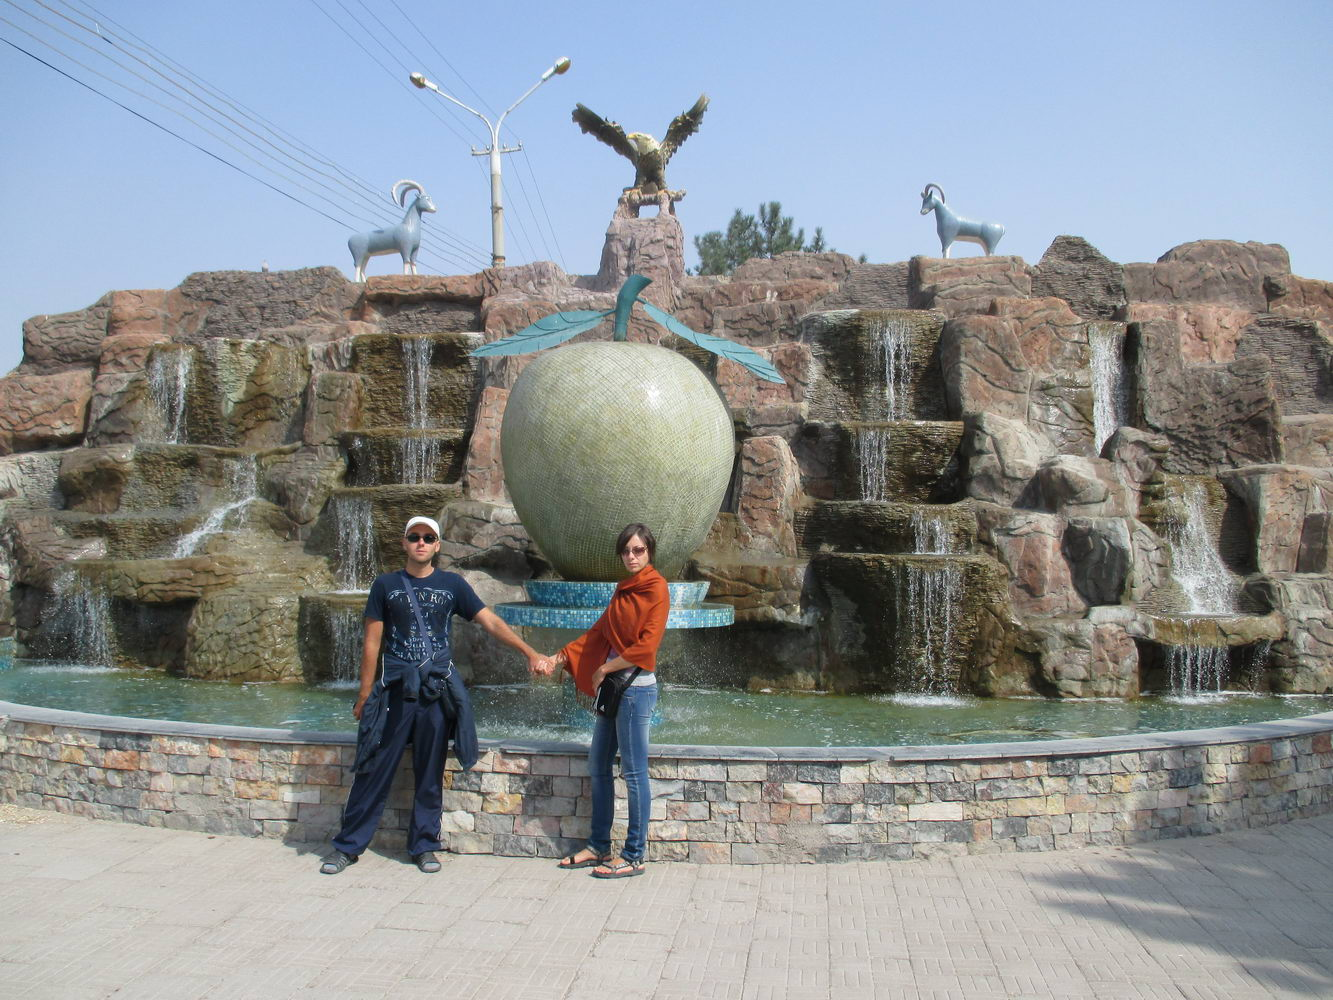 яблоко символ города. узбекистан алмалык